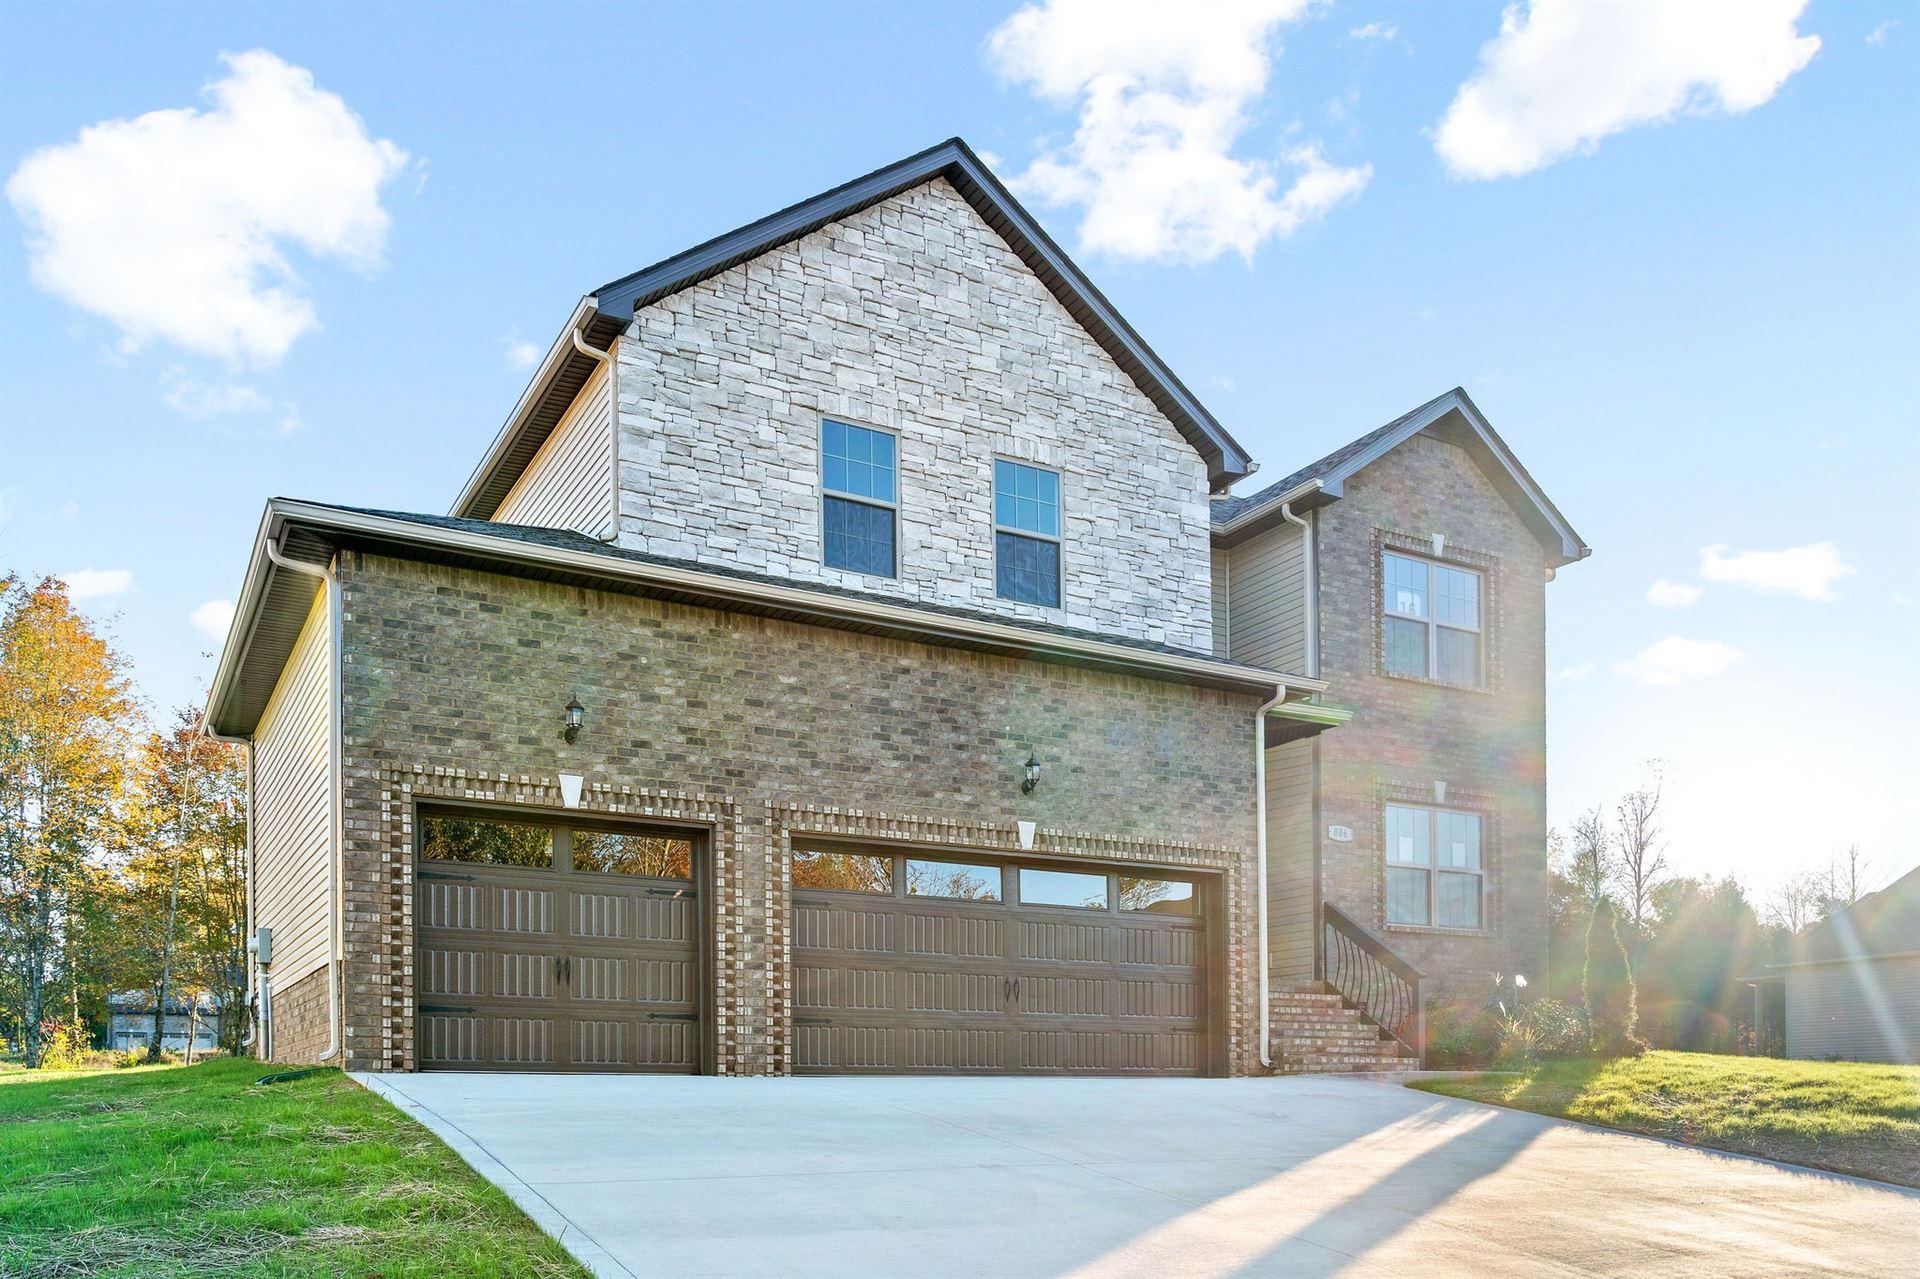 806 Snapdragon Ct, Clarksville, TN 37042 - MLS#: 2214100